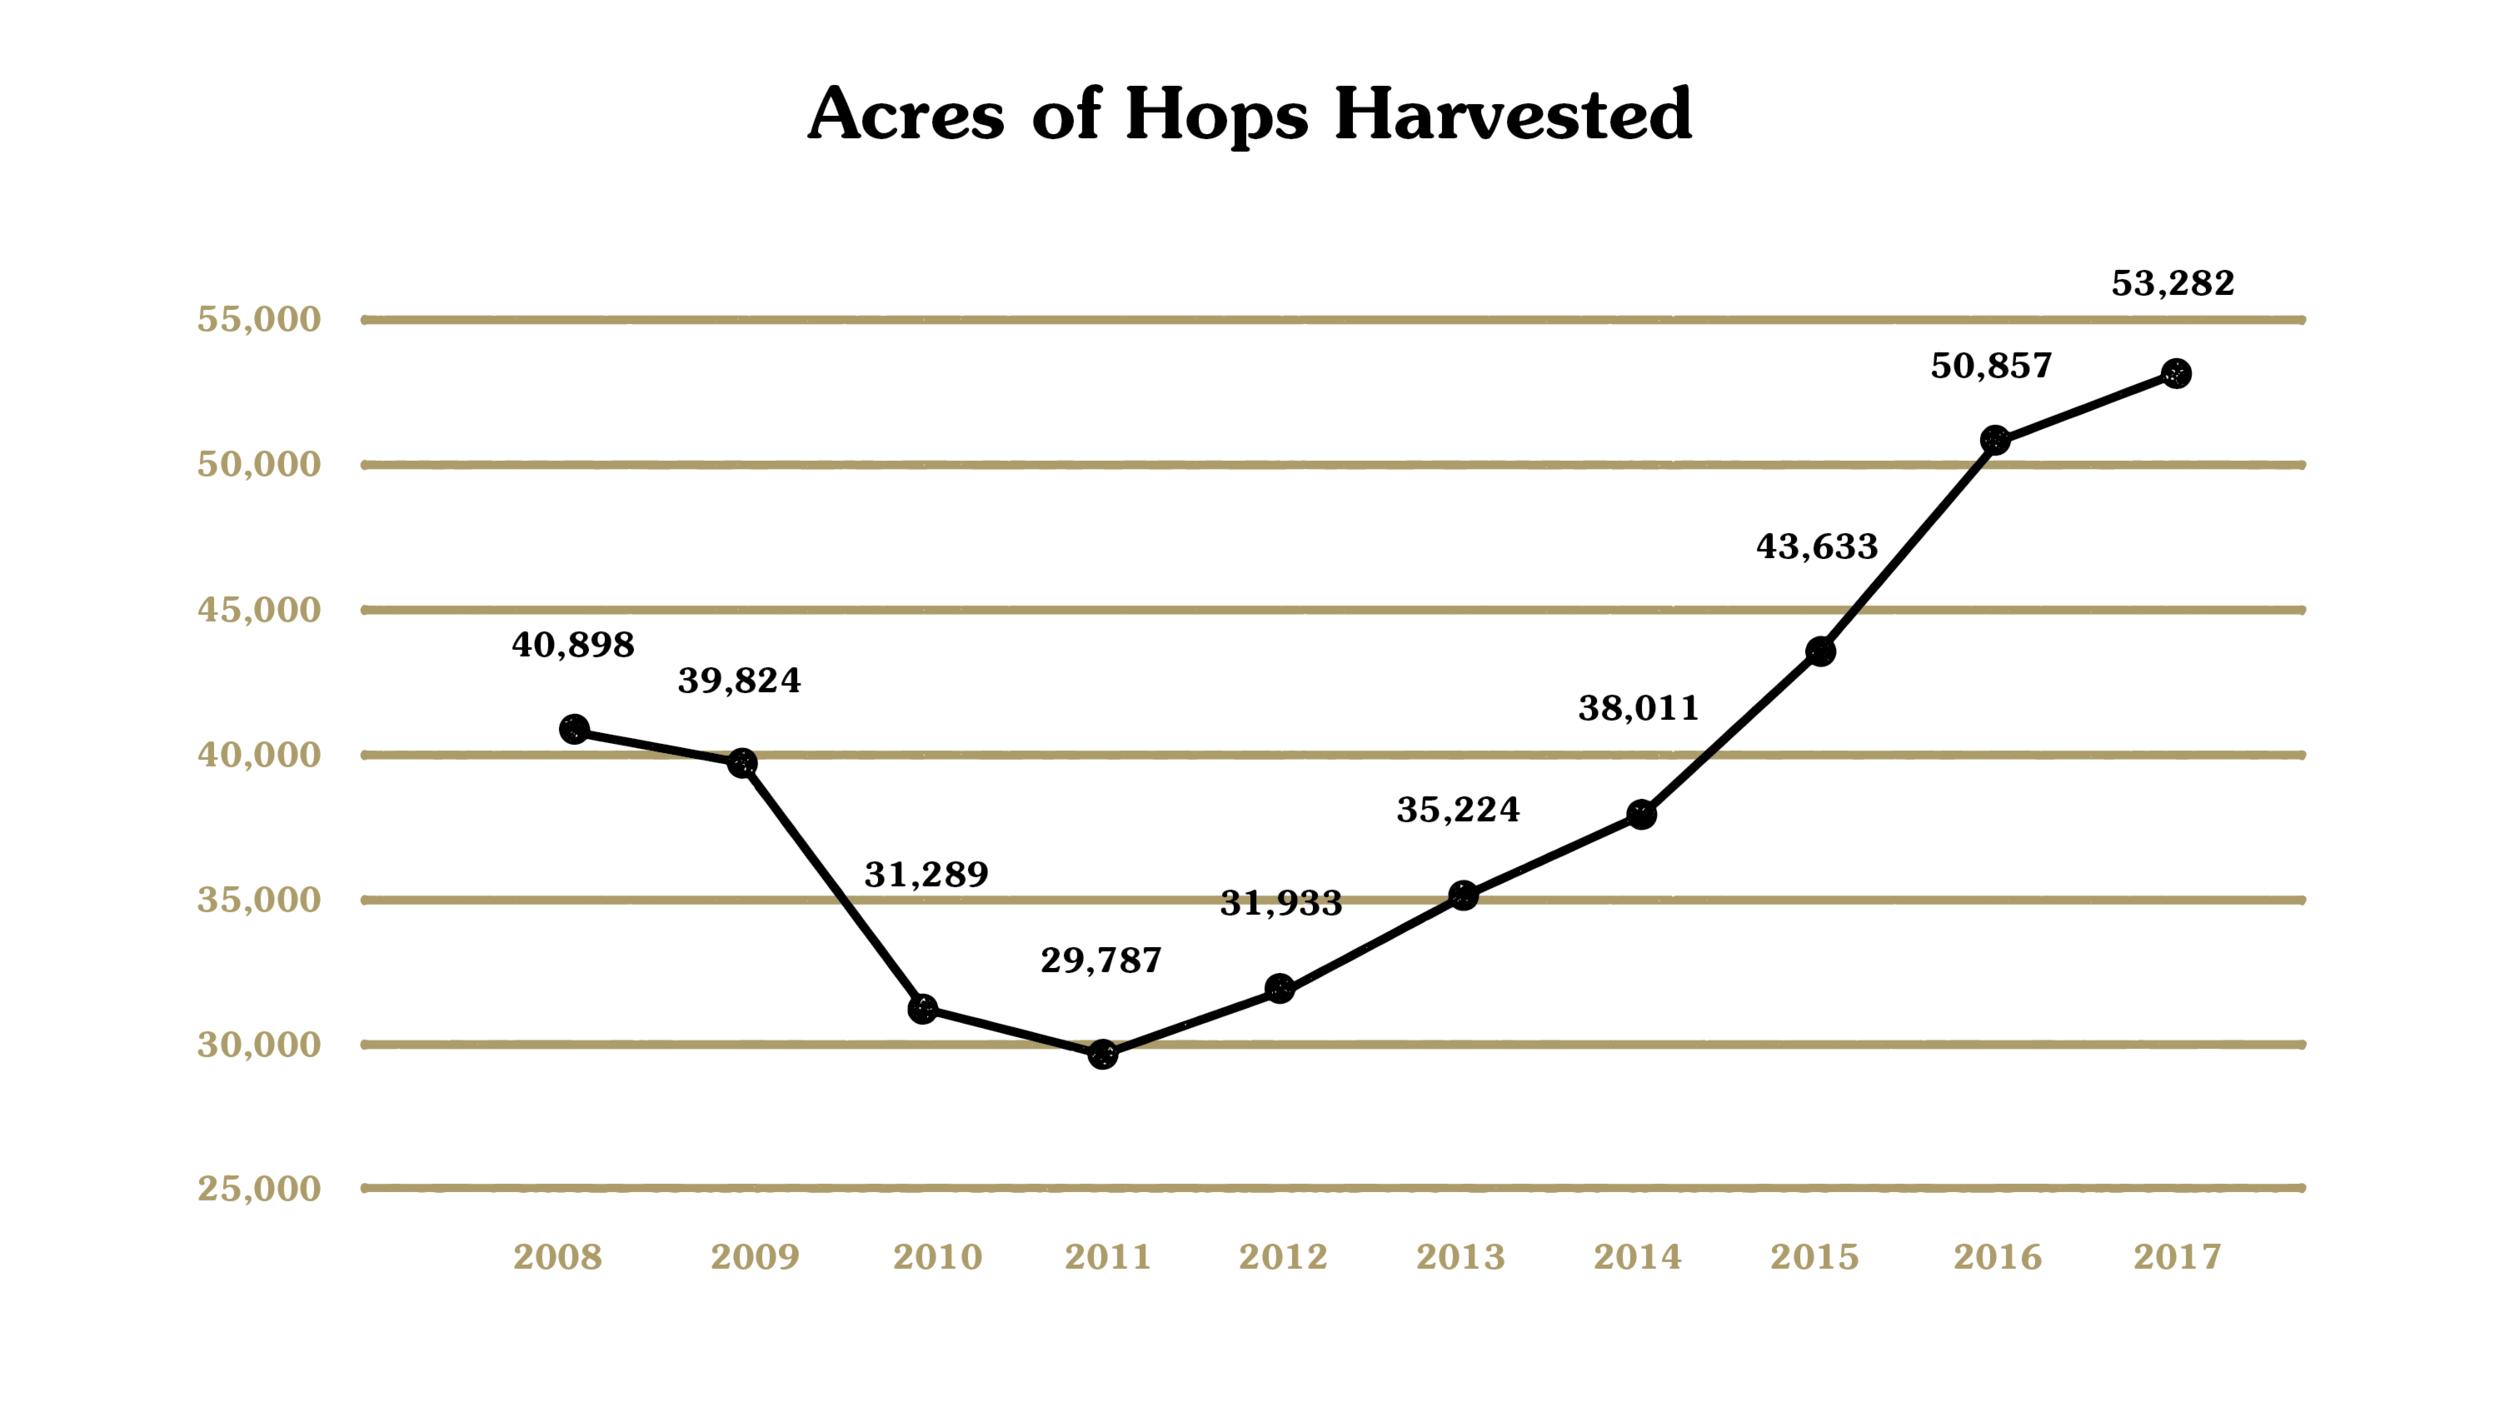 source:Hop Growers of America